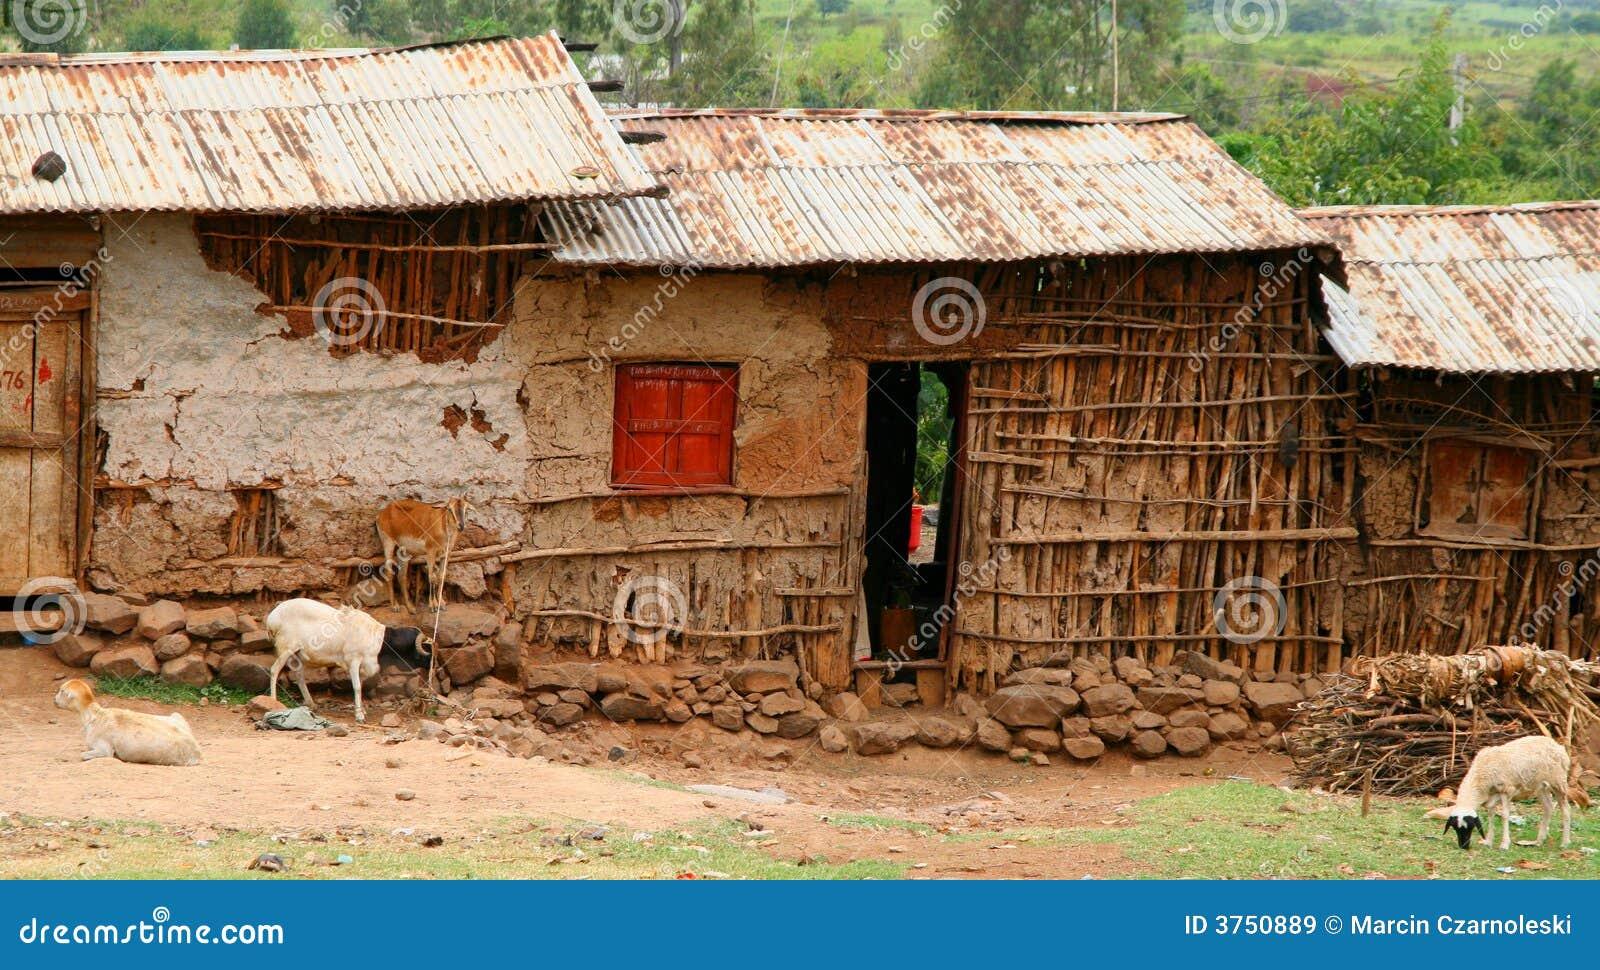 Case africane in etiopia immagine stock immagine di for Immagini case